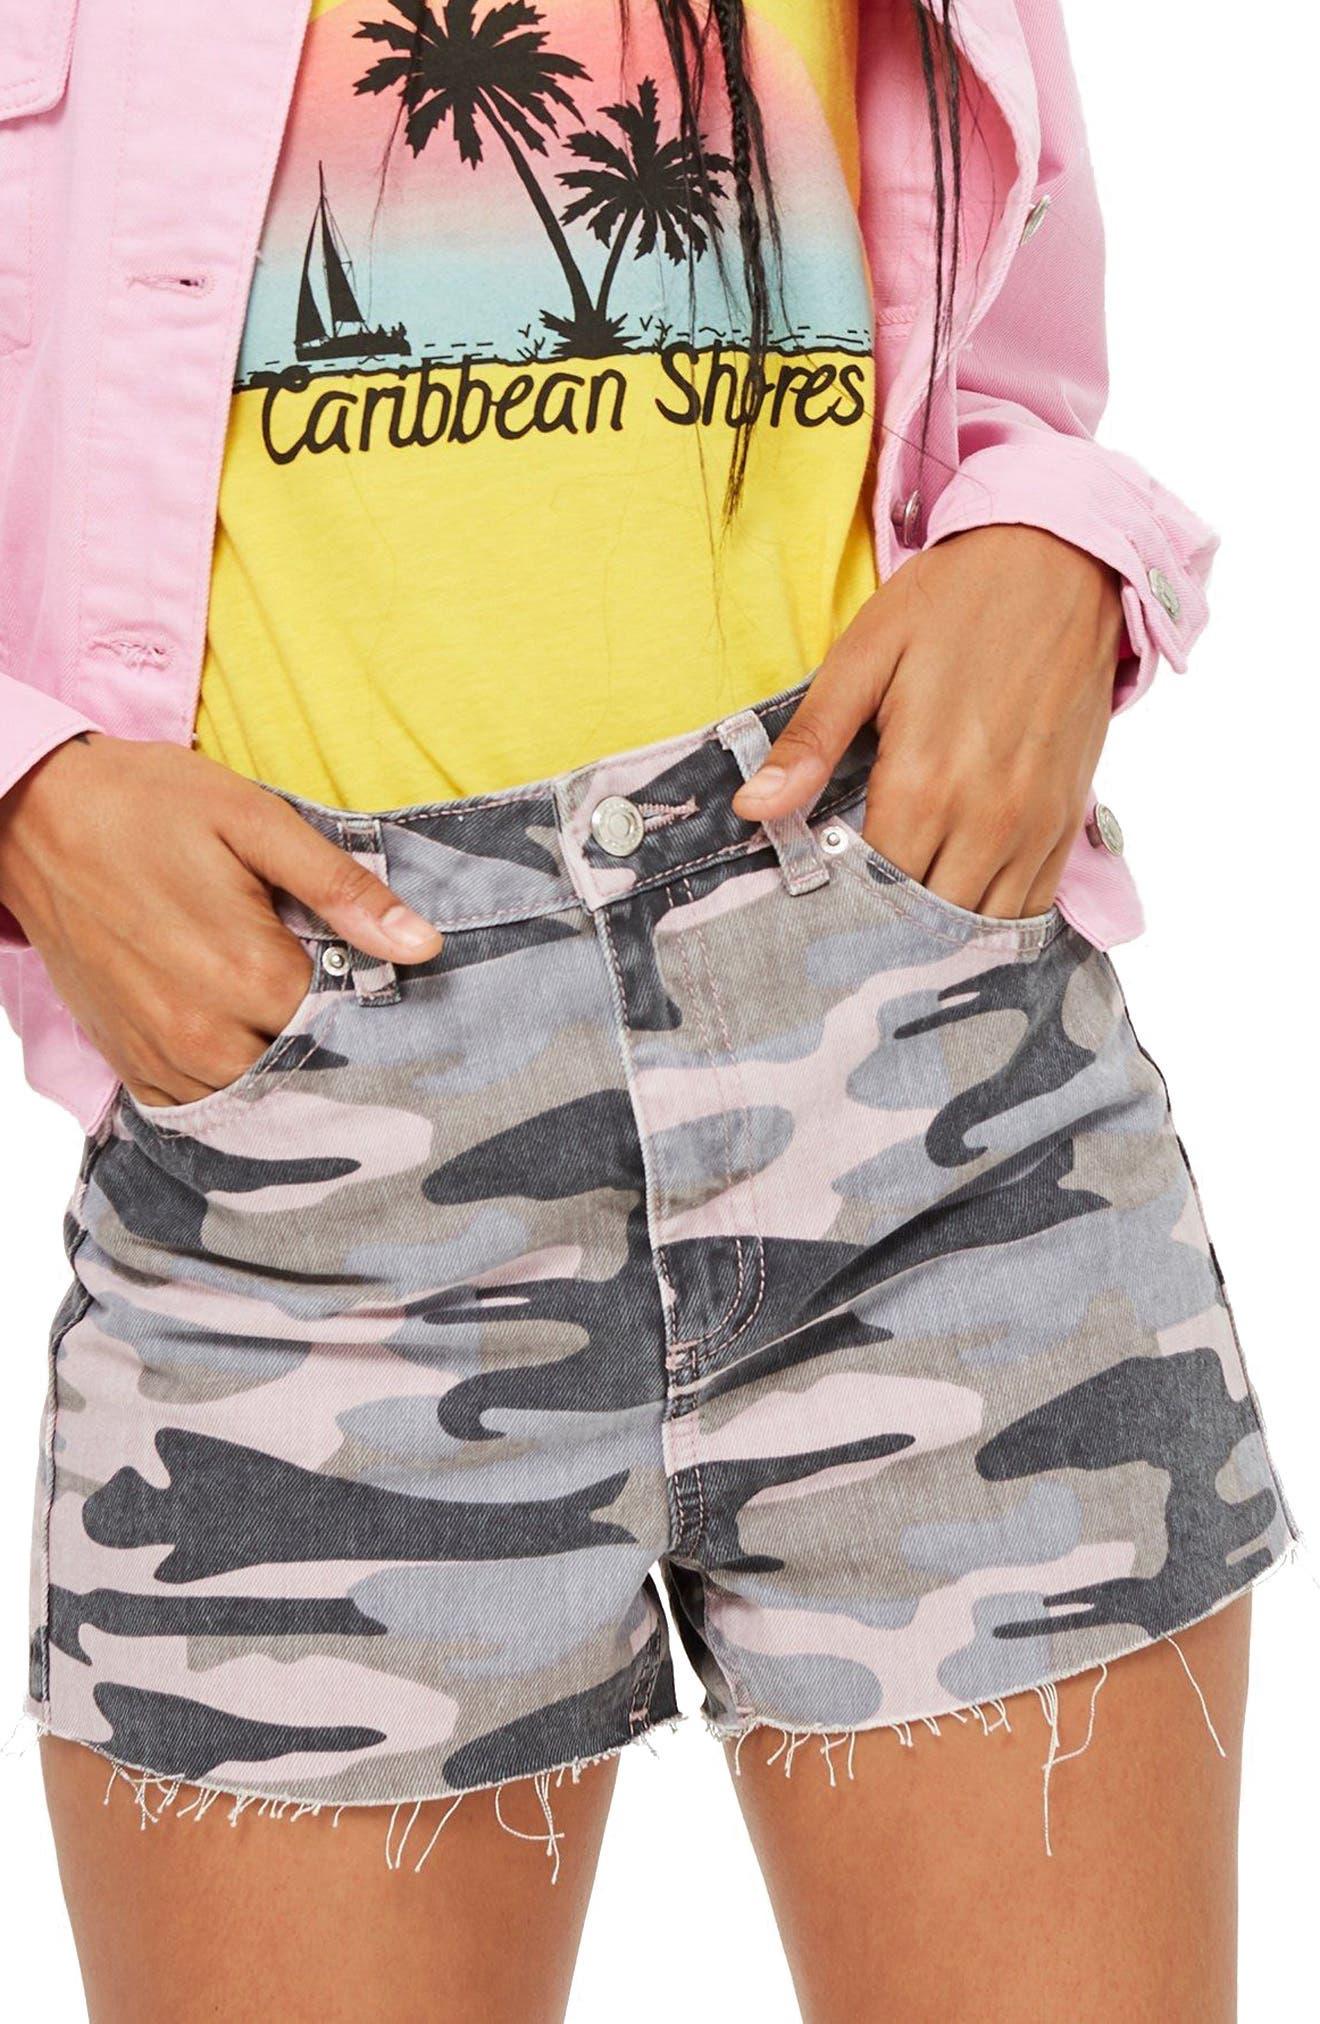 MOTO Fray Hem High Waist Shorts,                             Main thumbnail 1, color,                             PINK MULTI